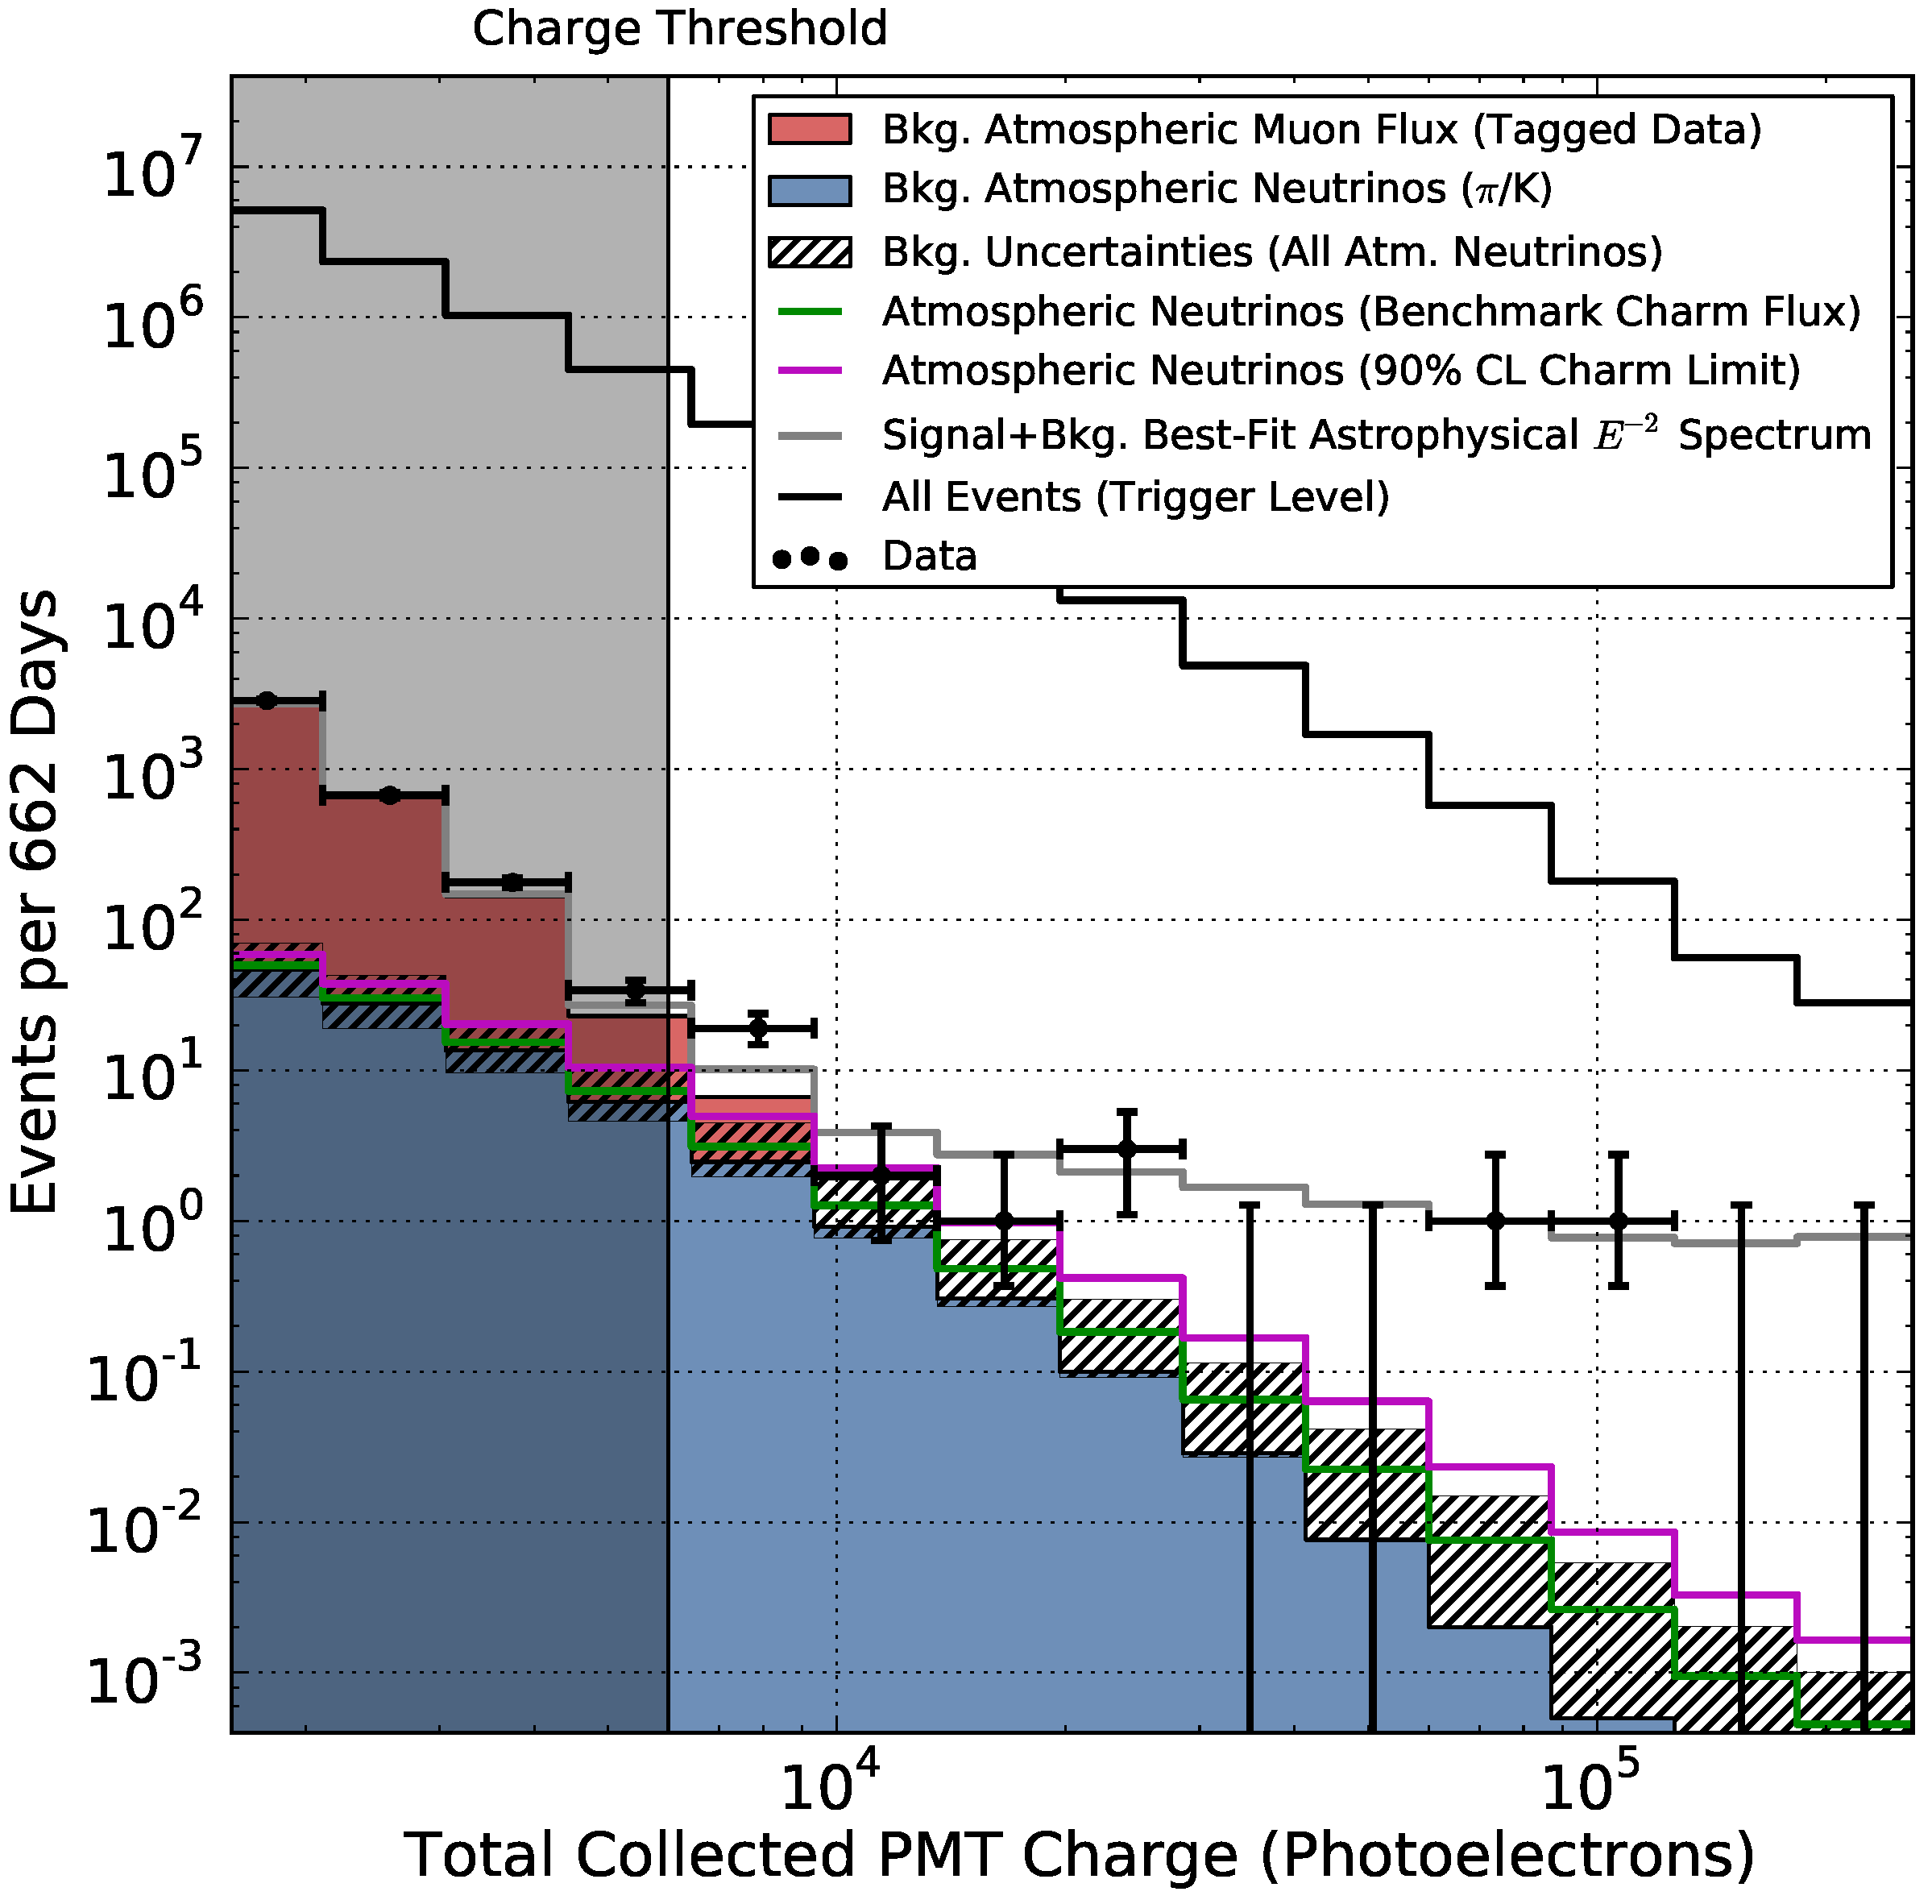 The flux of extraterrestrial high-energy neutrinos in IceCube